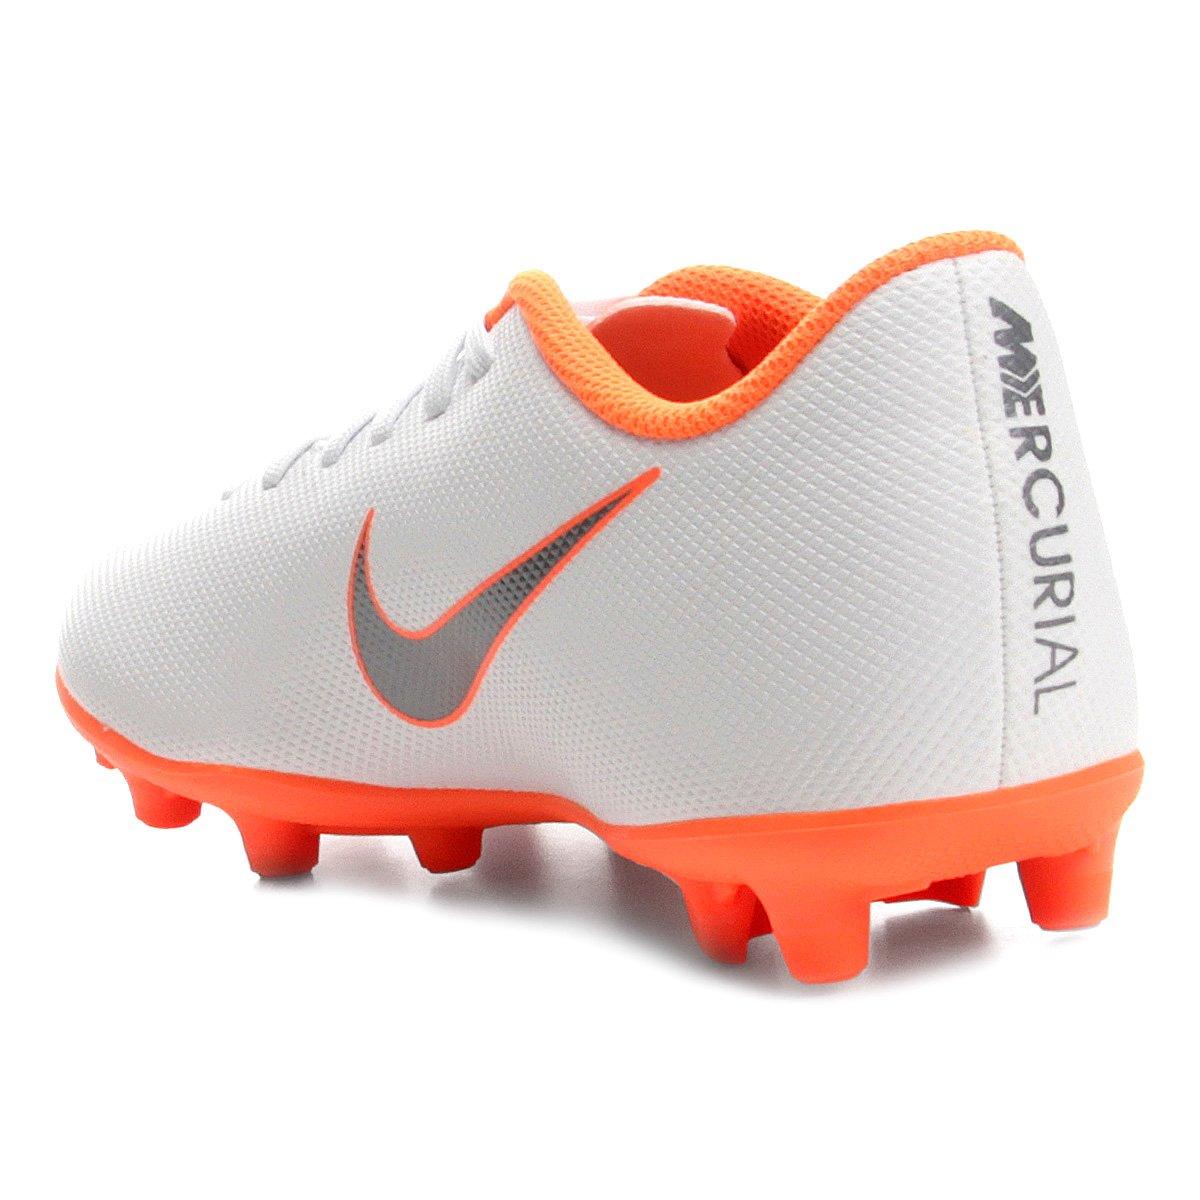 fb4ed268f5 Chuteira Campo Nike Mercurial Vapor 12 Club - Branco e Cinza ...